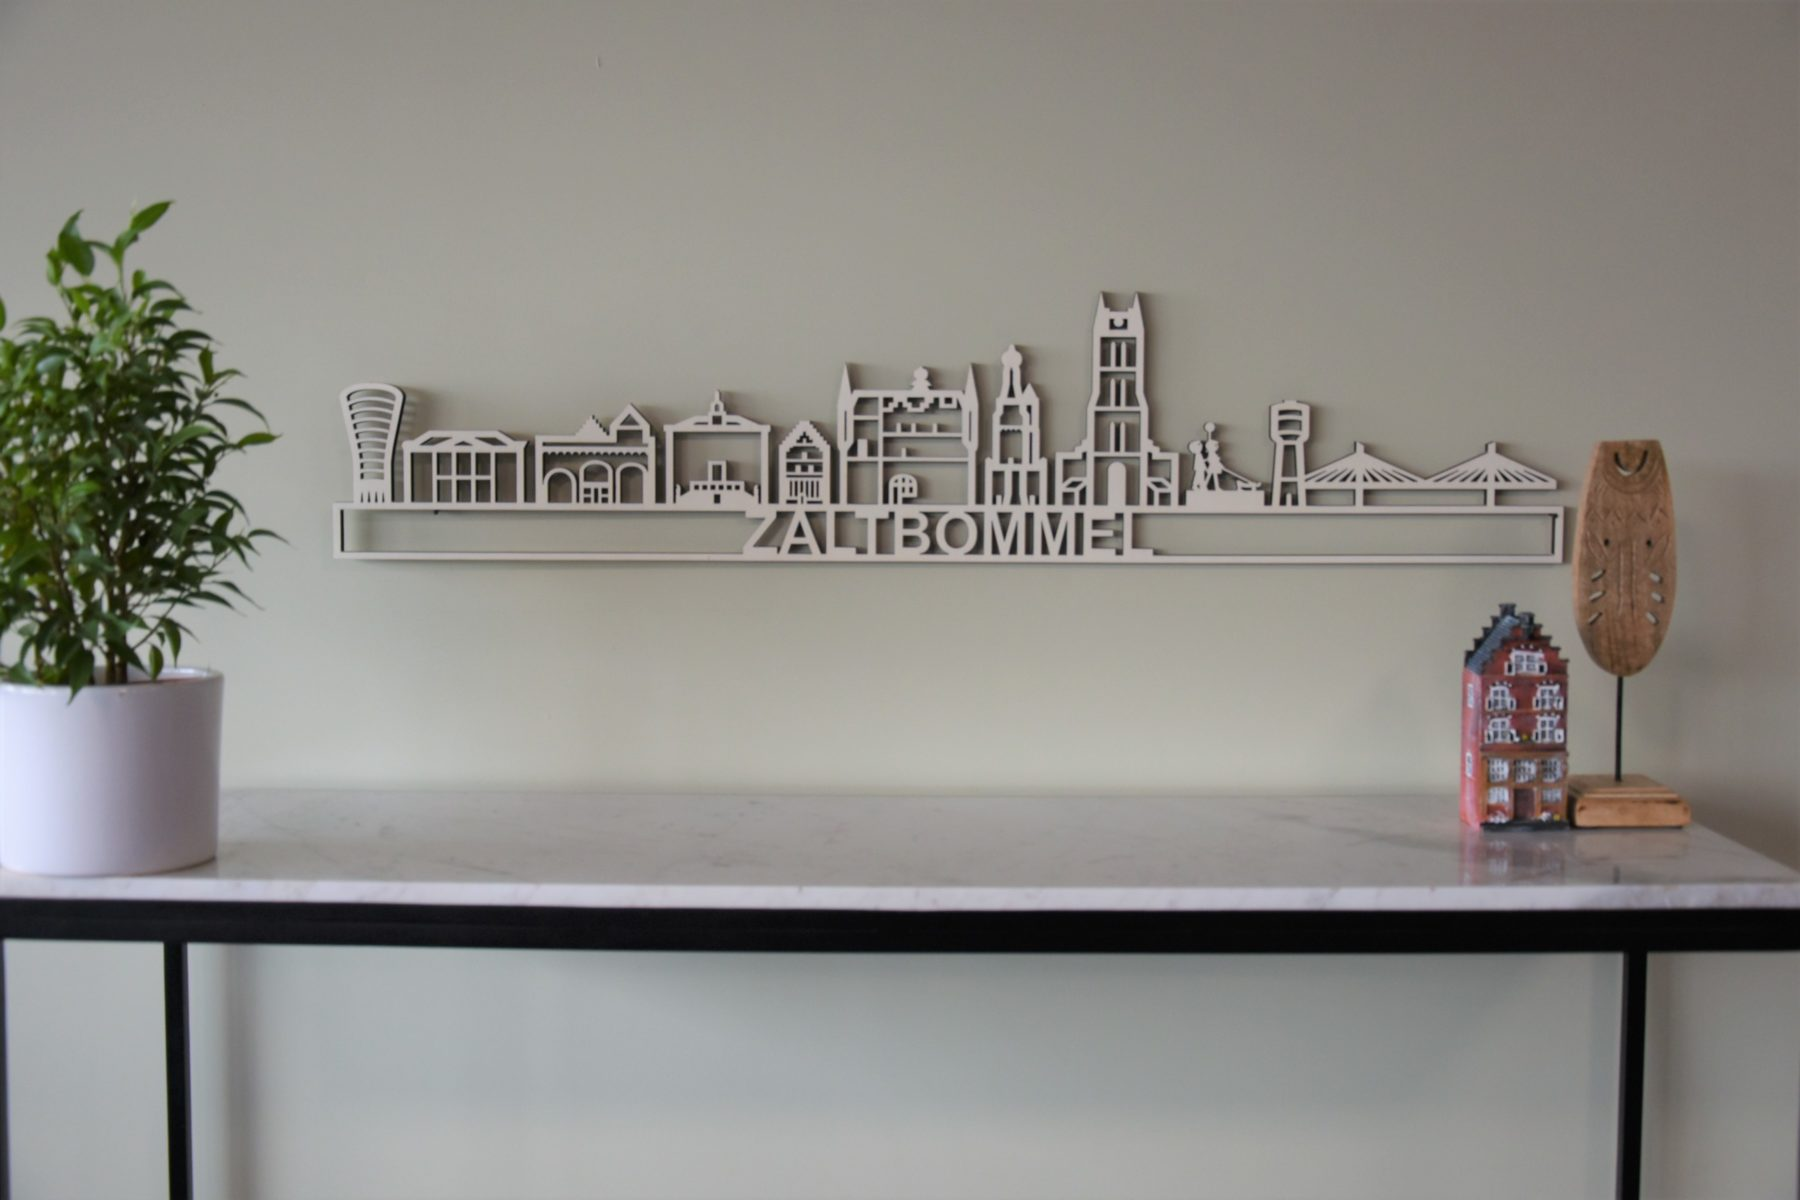 Houten skyline Zaltbommel